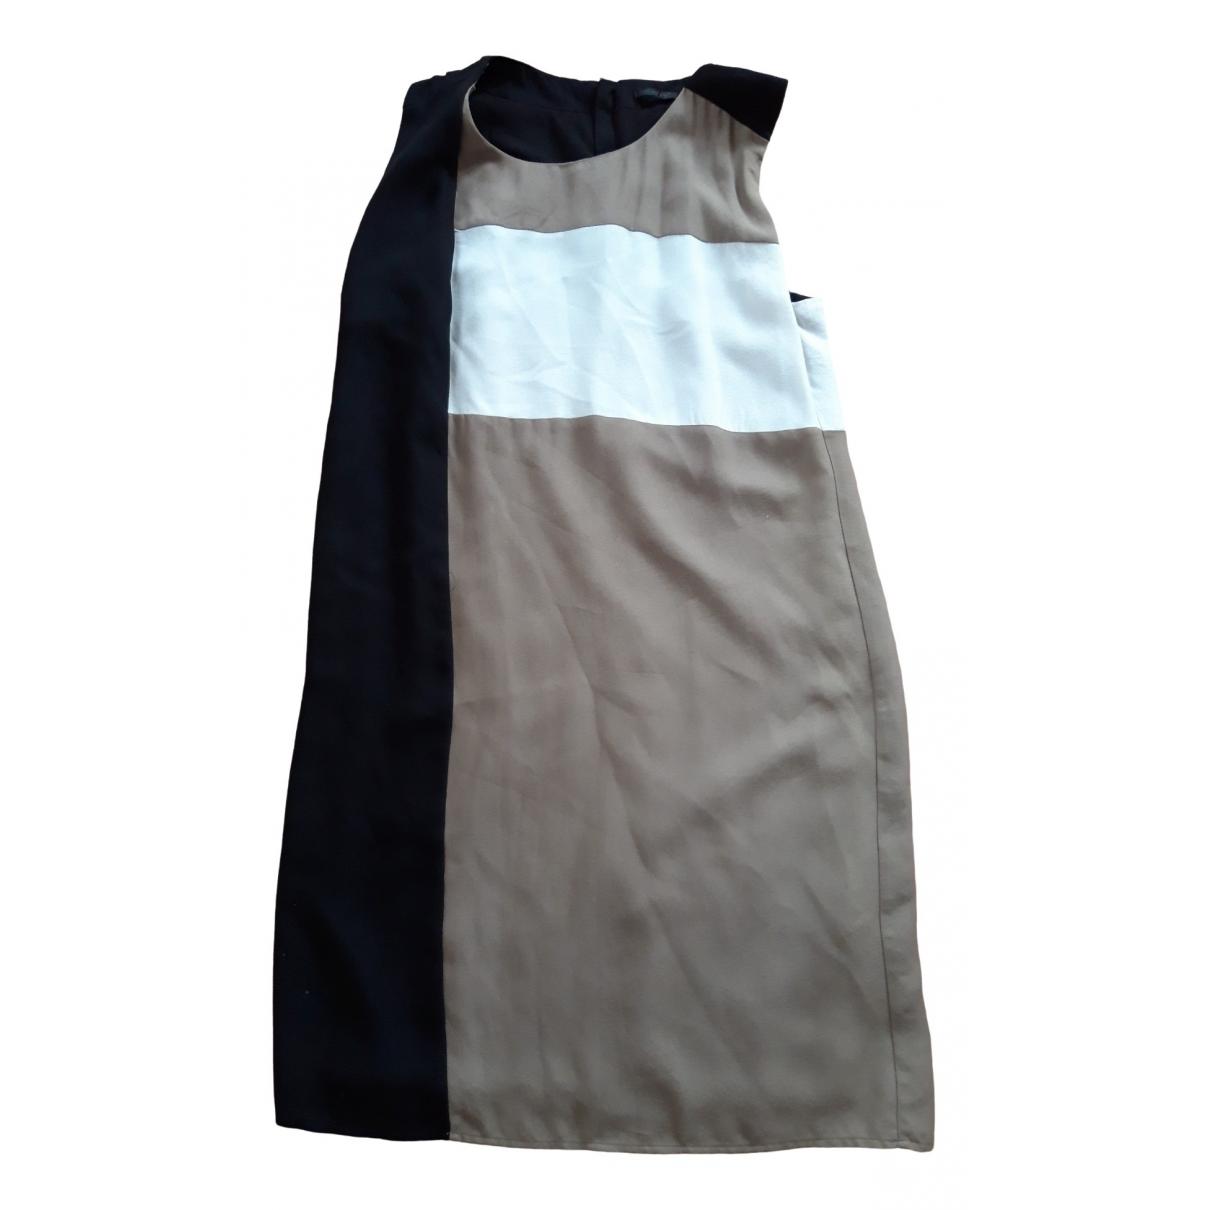 Ikks \N Kleid in  Braun Polyester